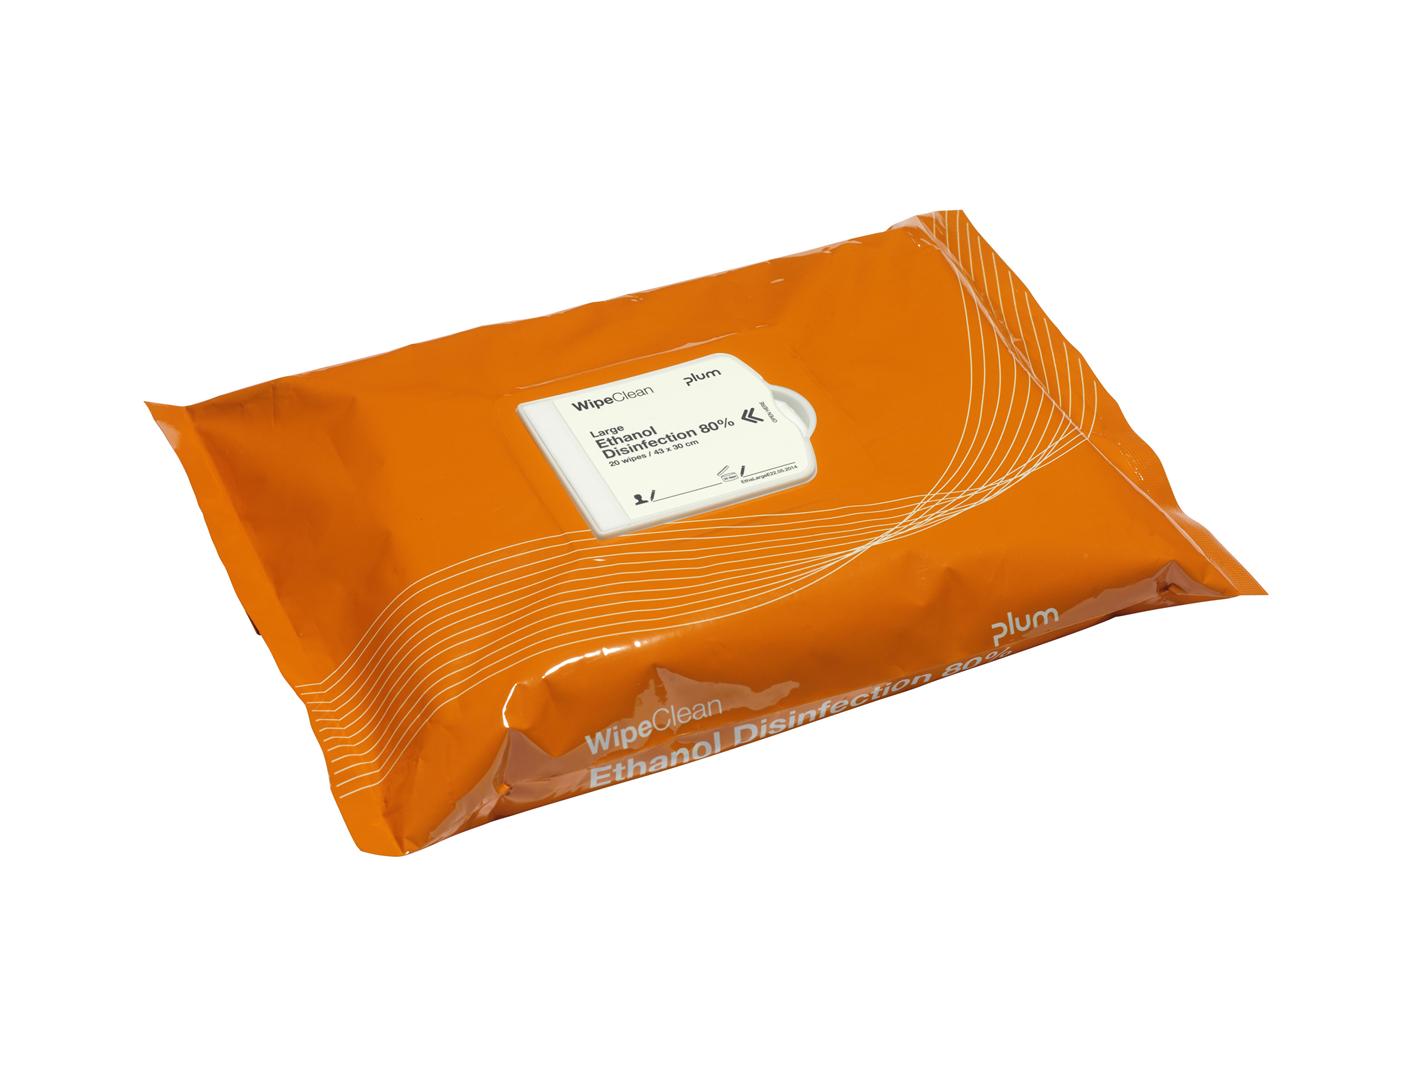 Wipeclean Plum Ethanol 80 % 25 stk